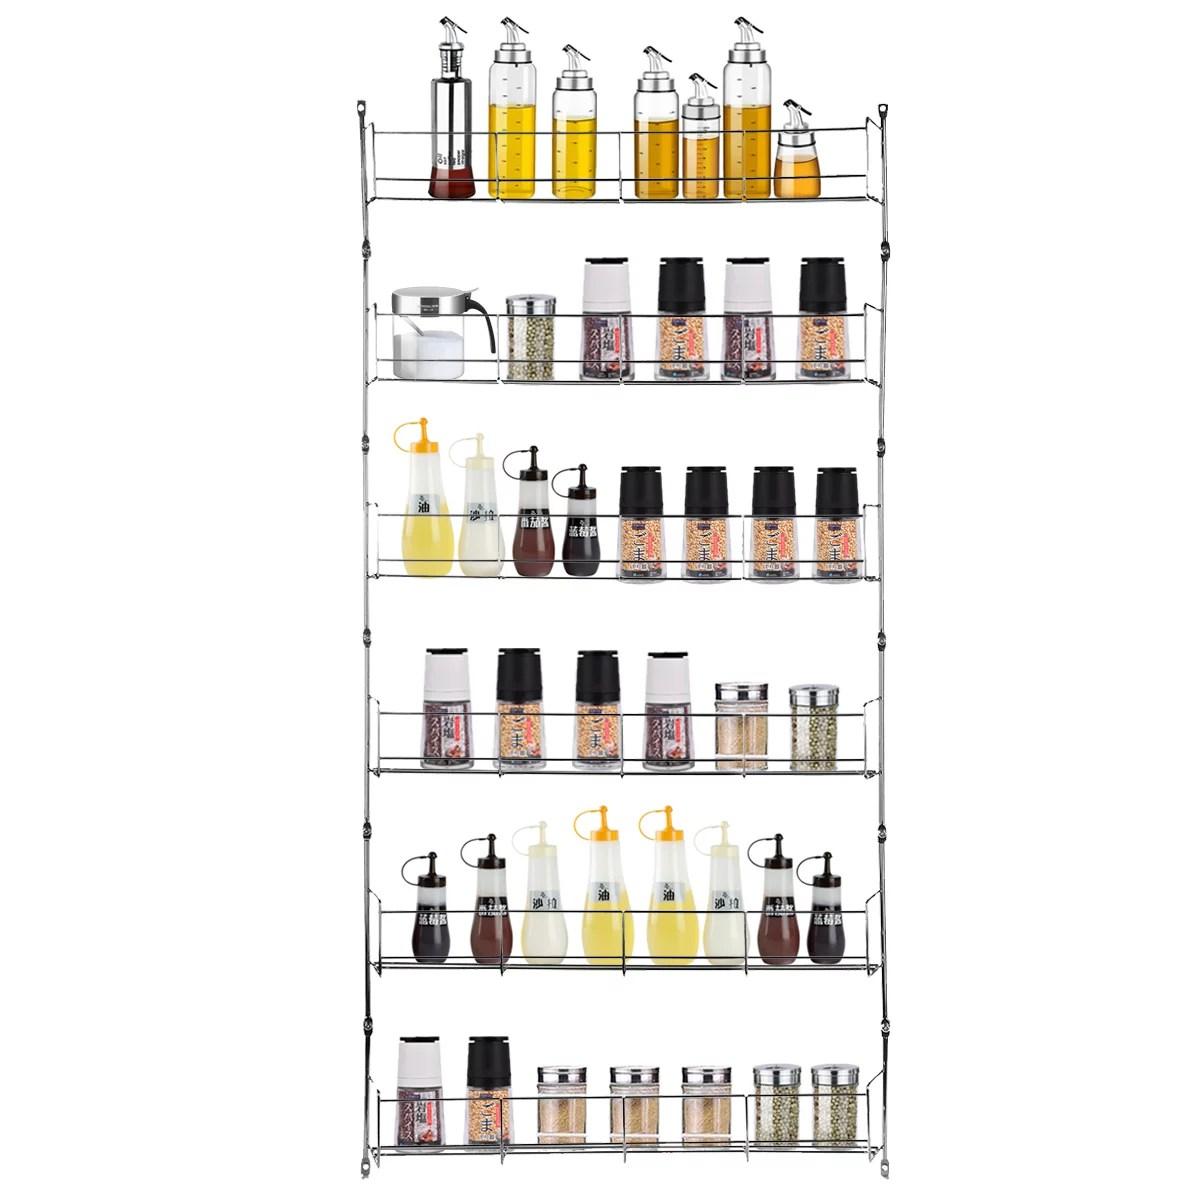 6 tier kitchen door wall mounted spice rack cabinet hanging organizer pantry herbs seasoning jars storage shelving holder walmart com